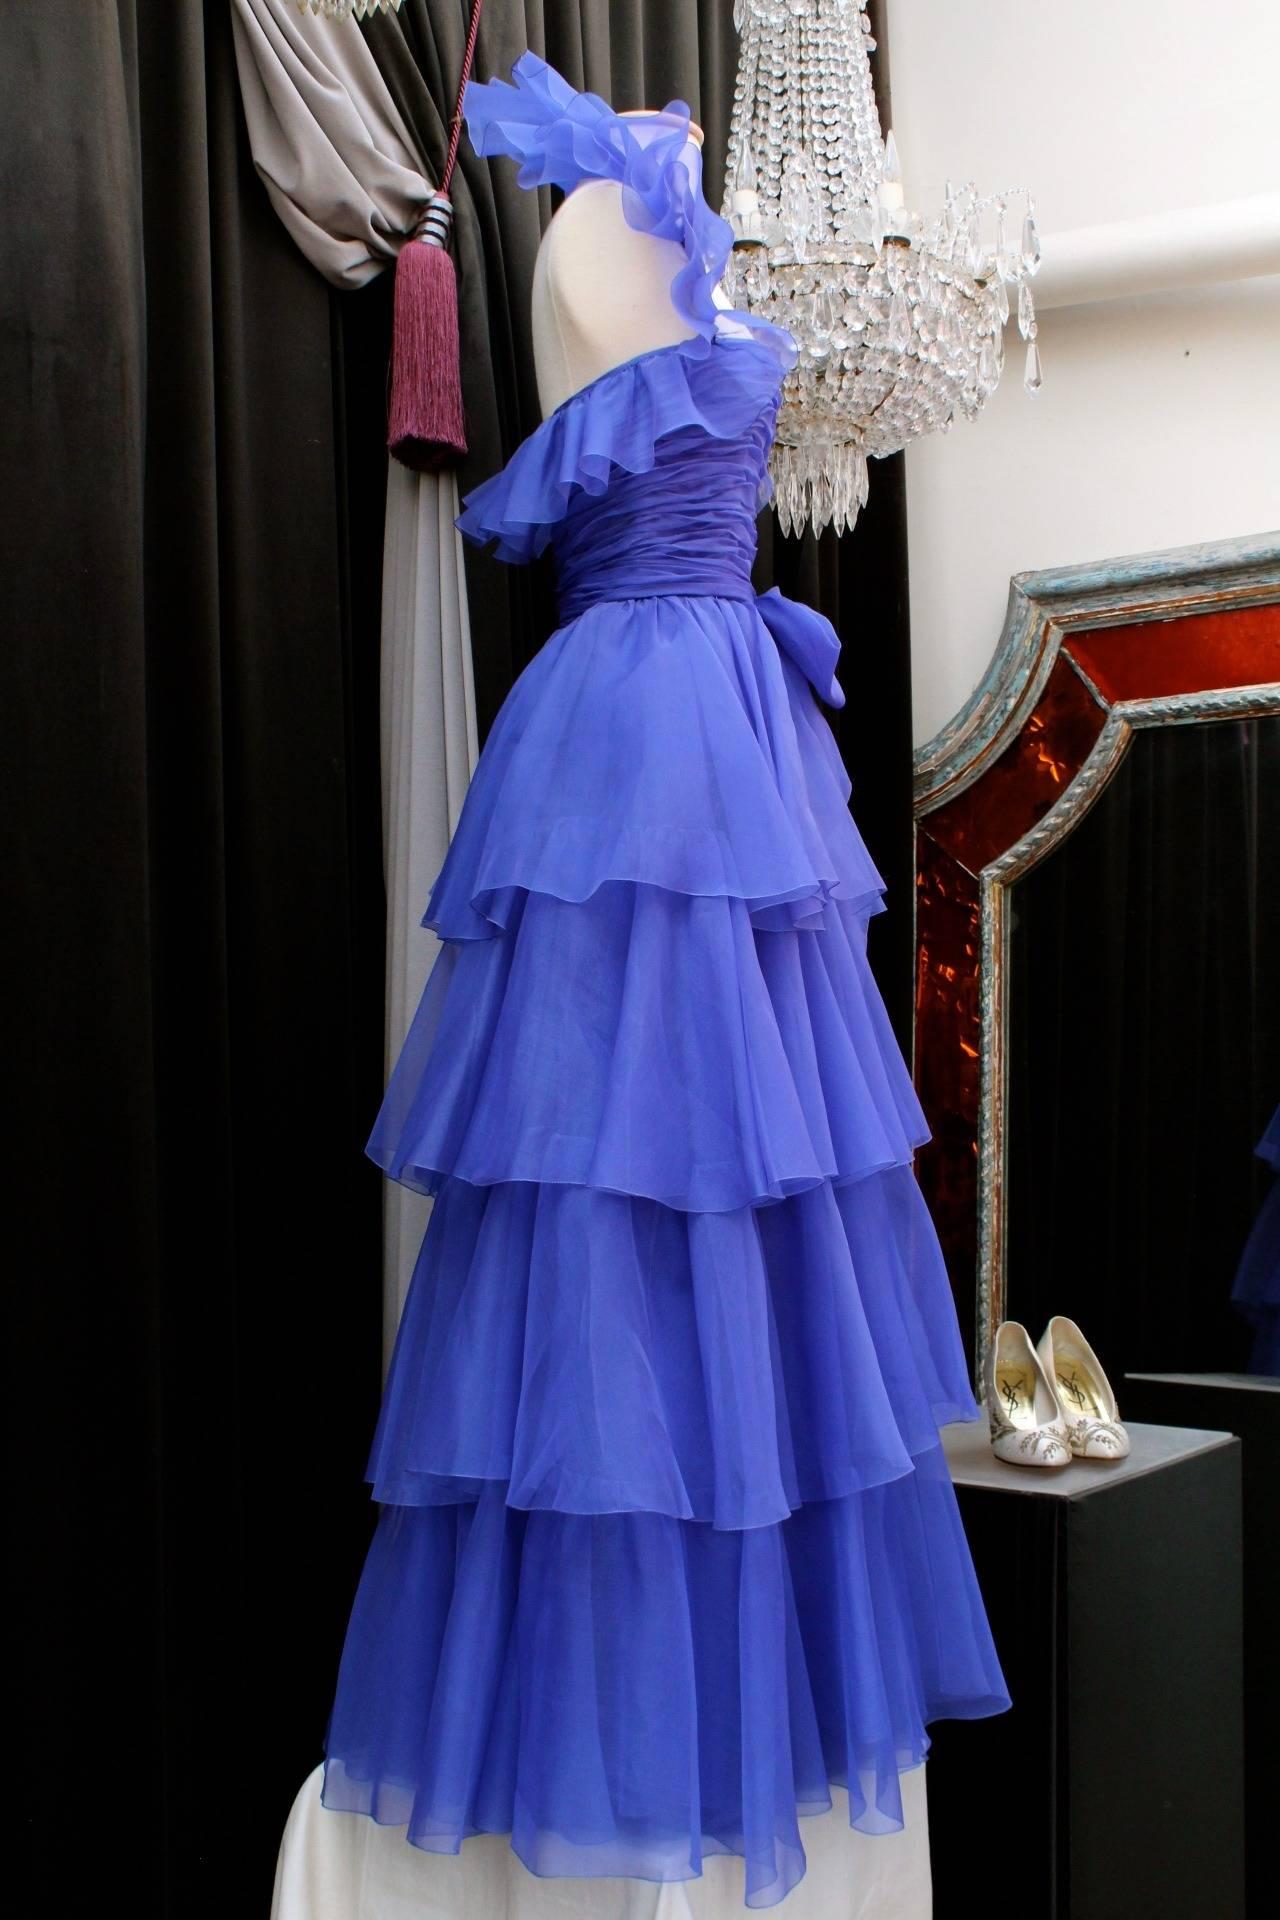 Women's Jean-Louis Scherrer Haute Couture Blue Organza Evening Gown, 1980s  For Sale